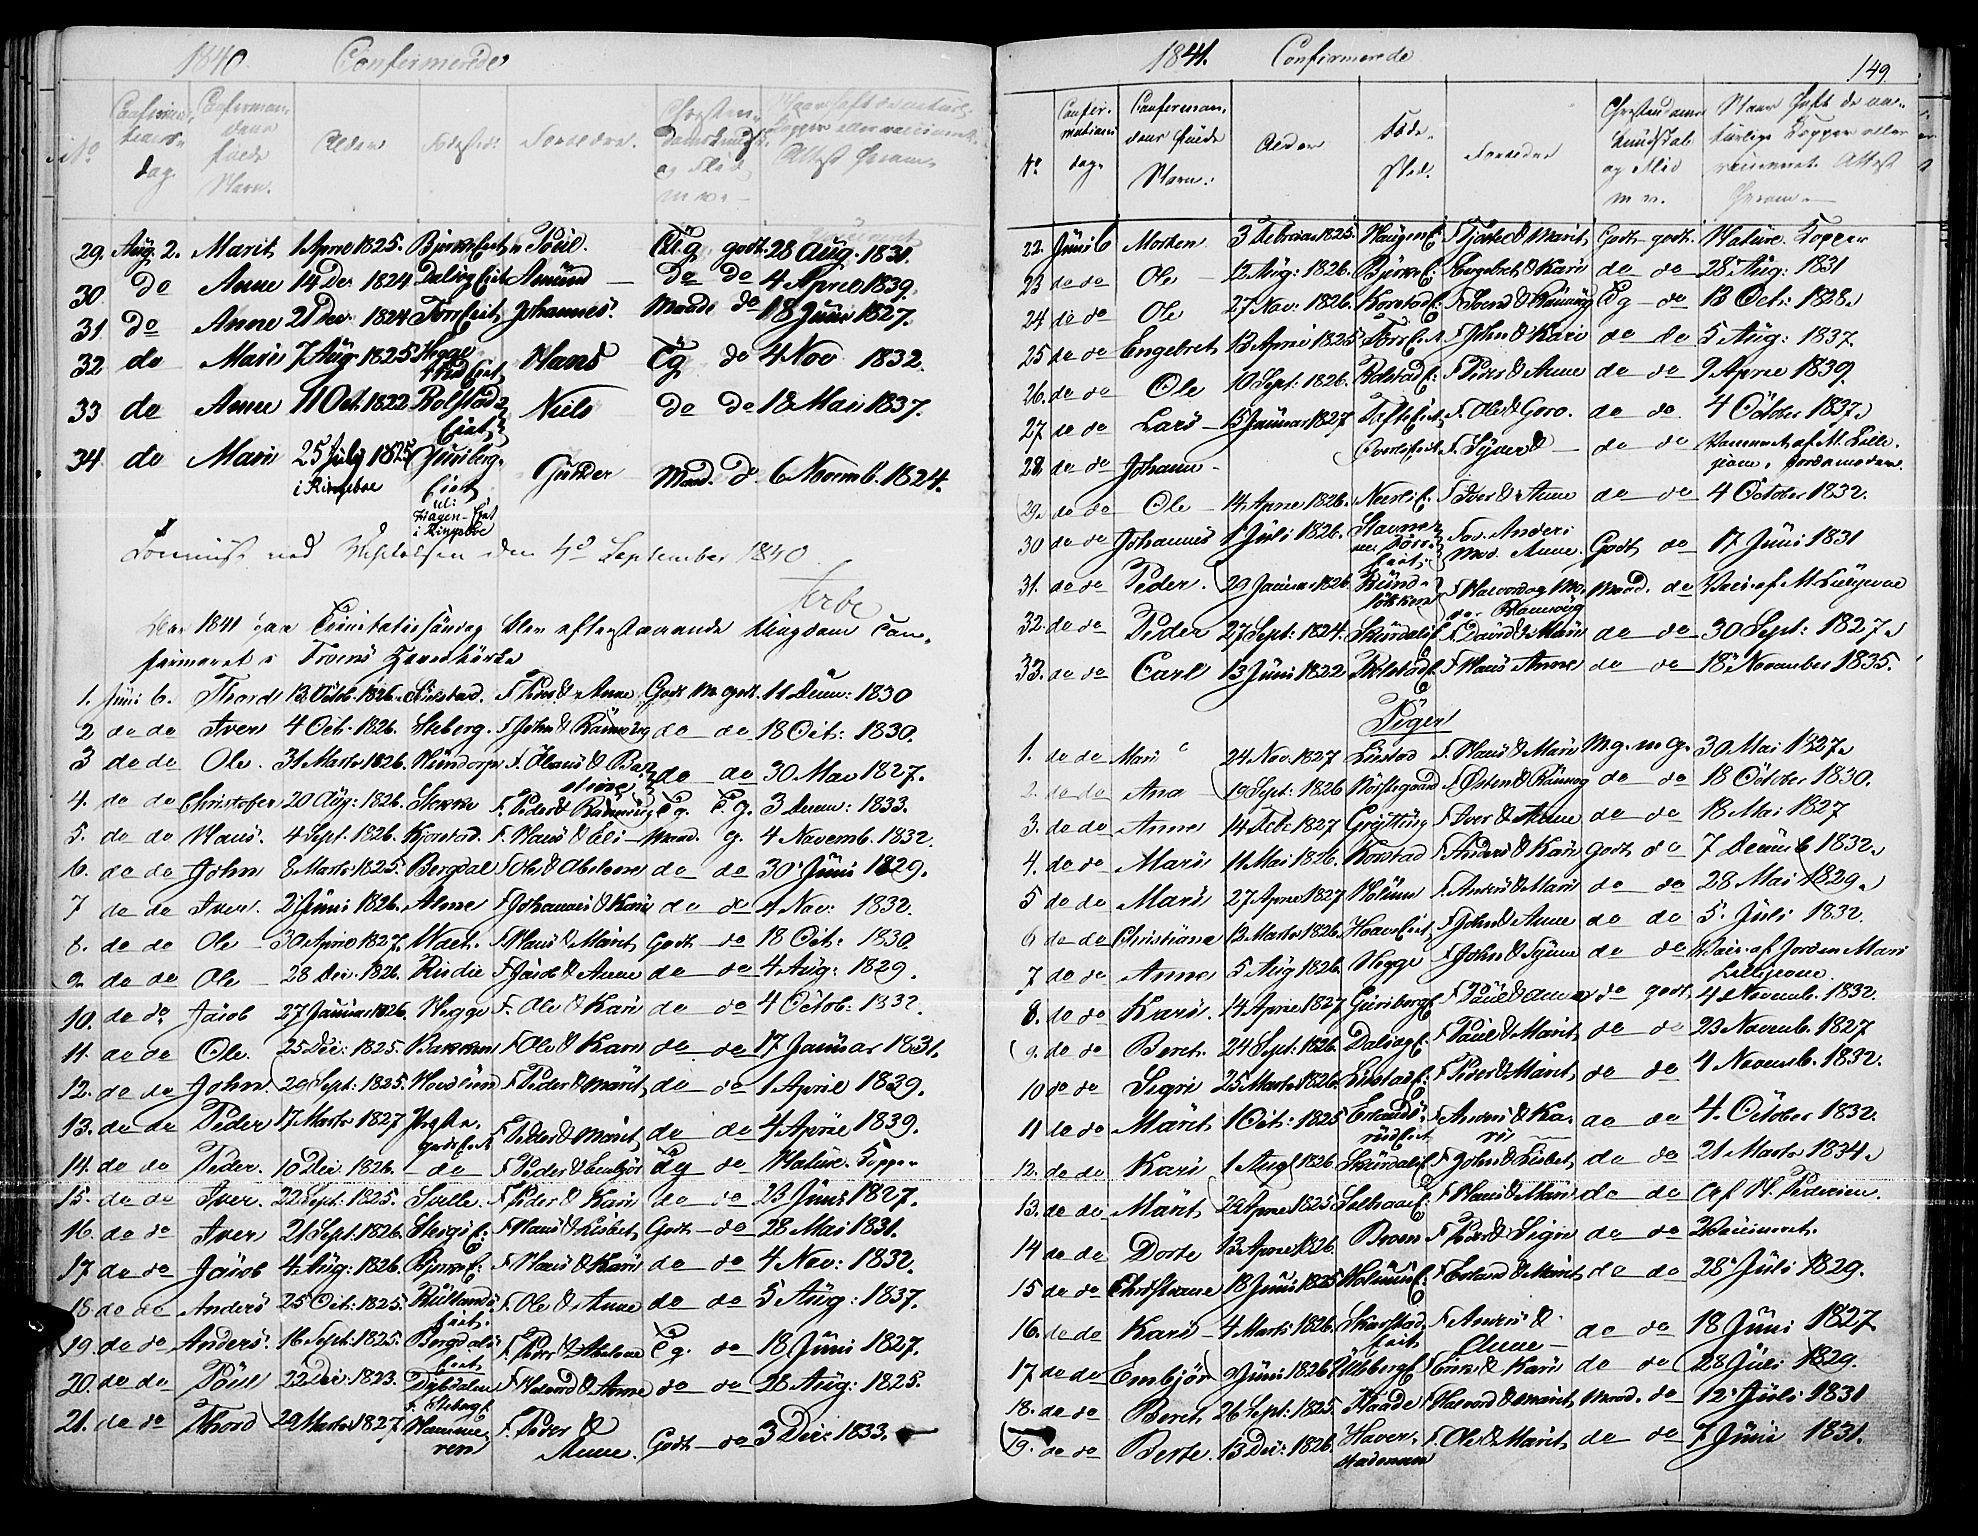 SAH, Fron prestekontor, H/Ha/Haa/L0004: Ministerialbok nr. 4, 1839-1848, s. 149